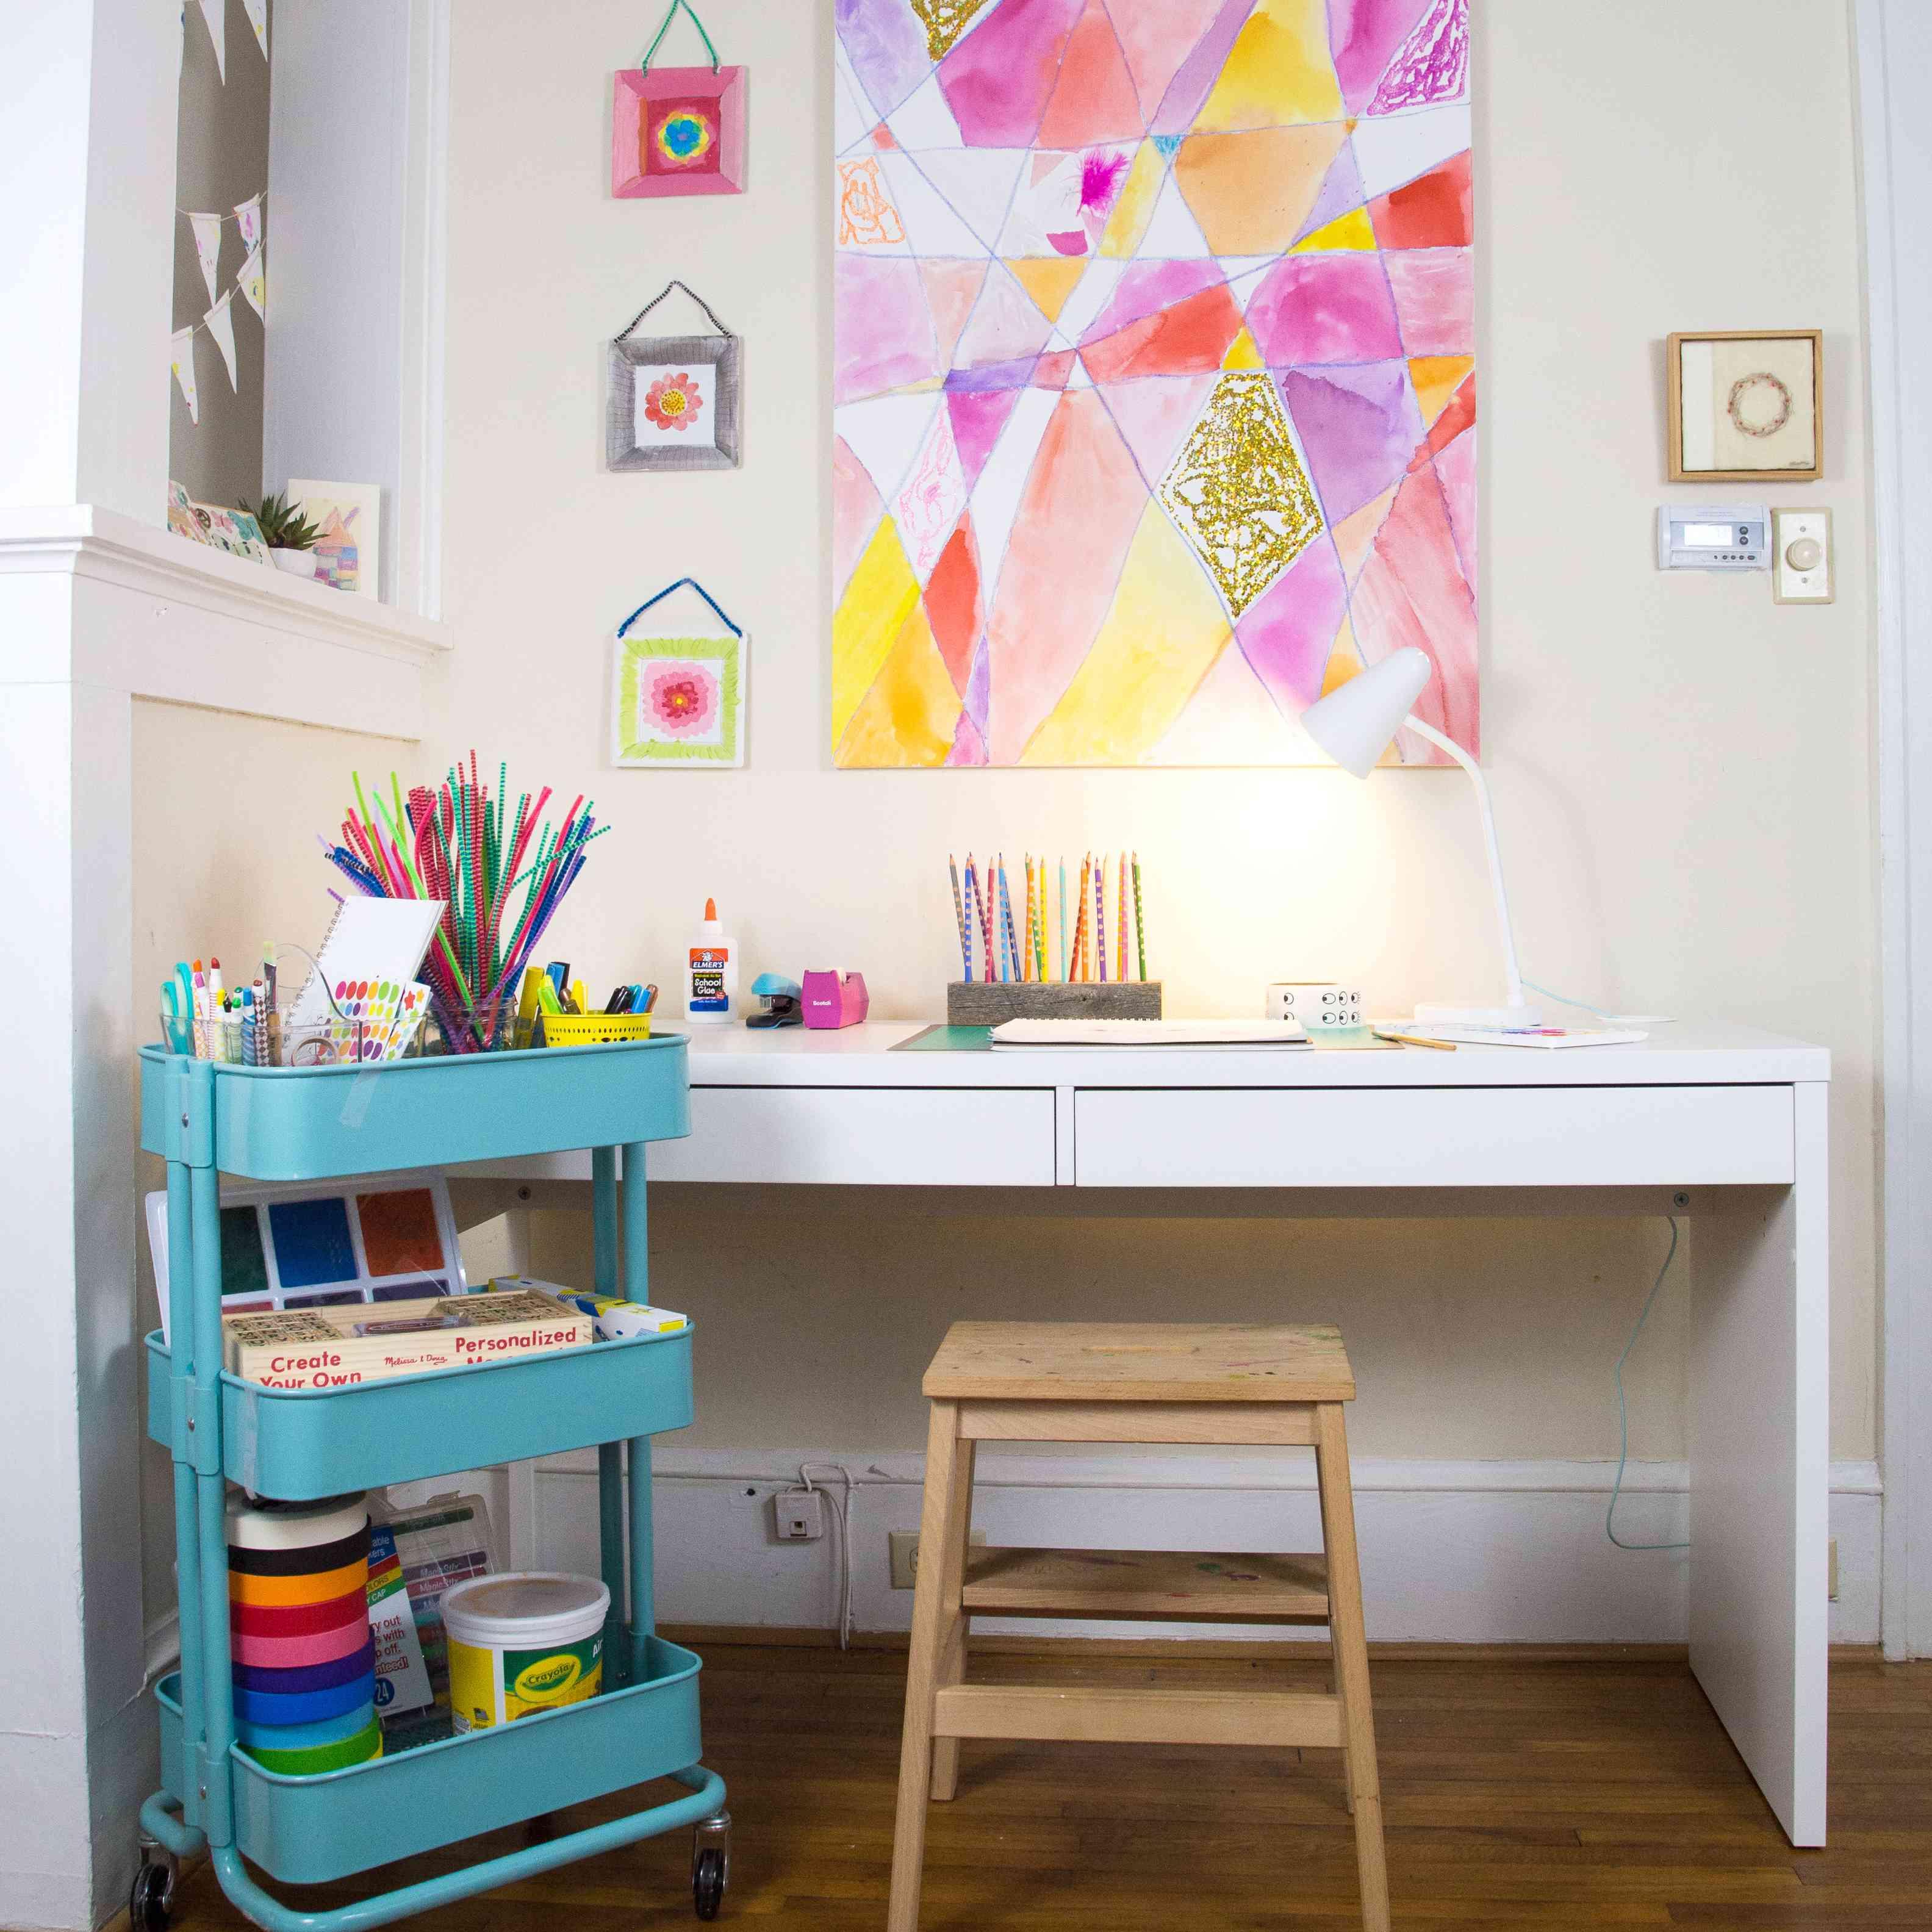 Kids' art corner with hanging displays, storage, and a desk